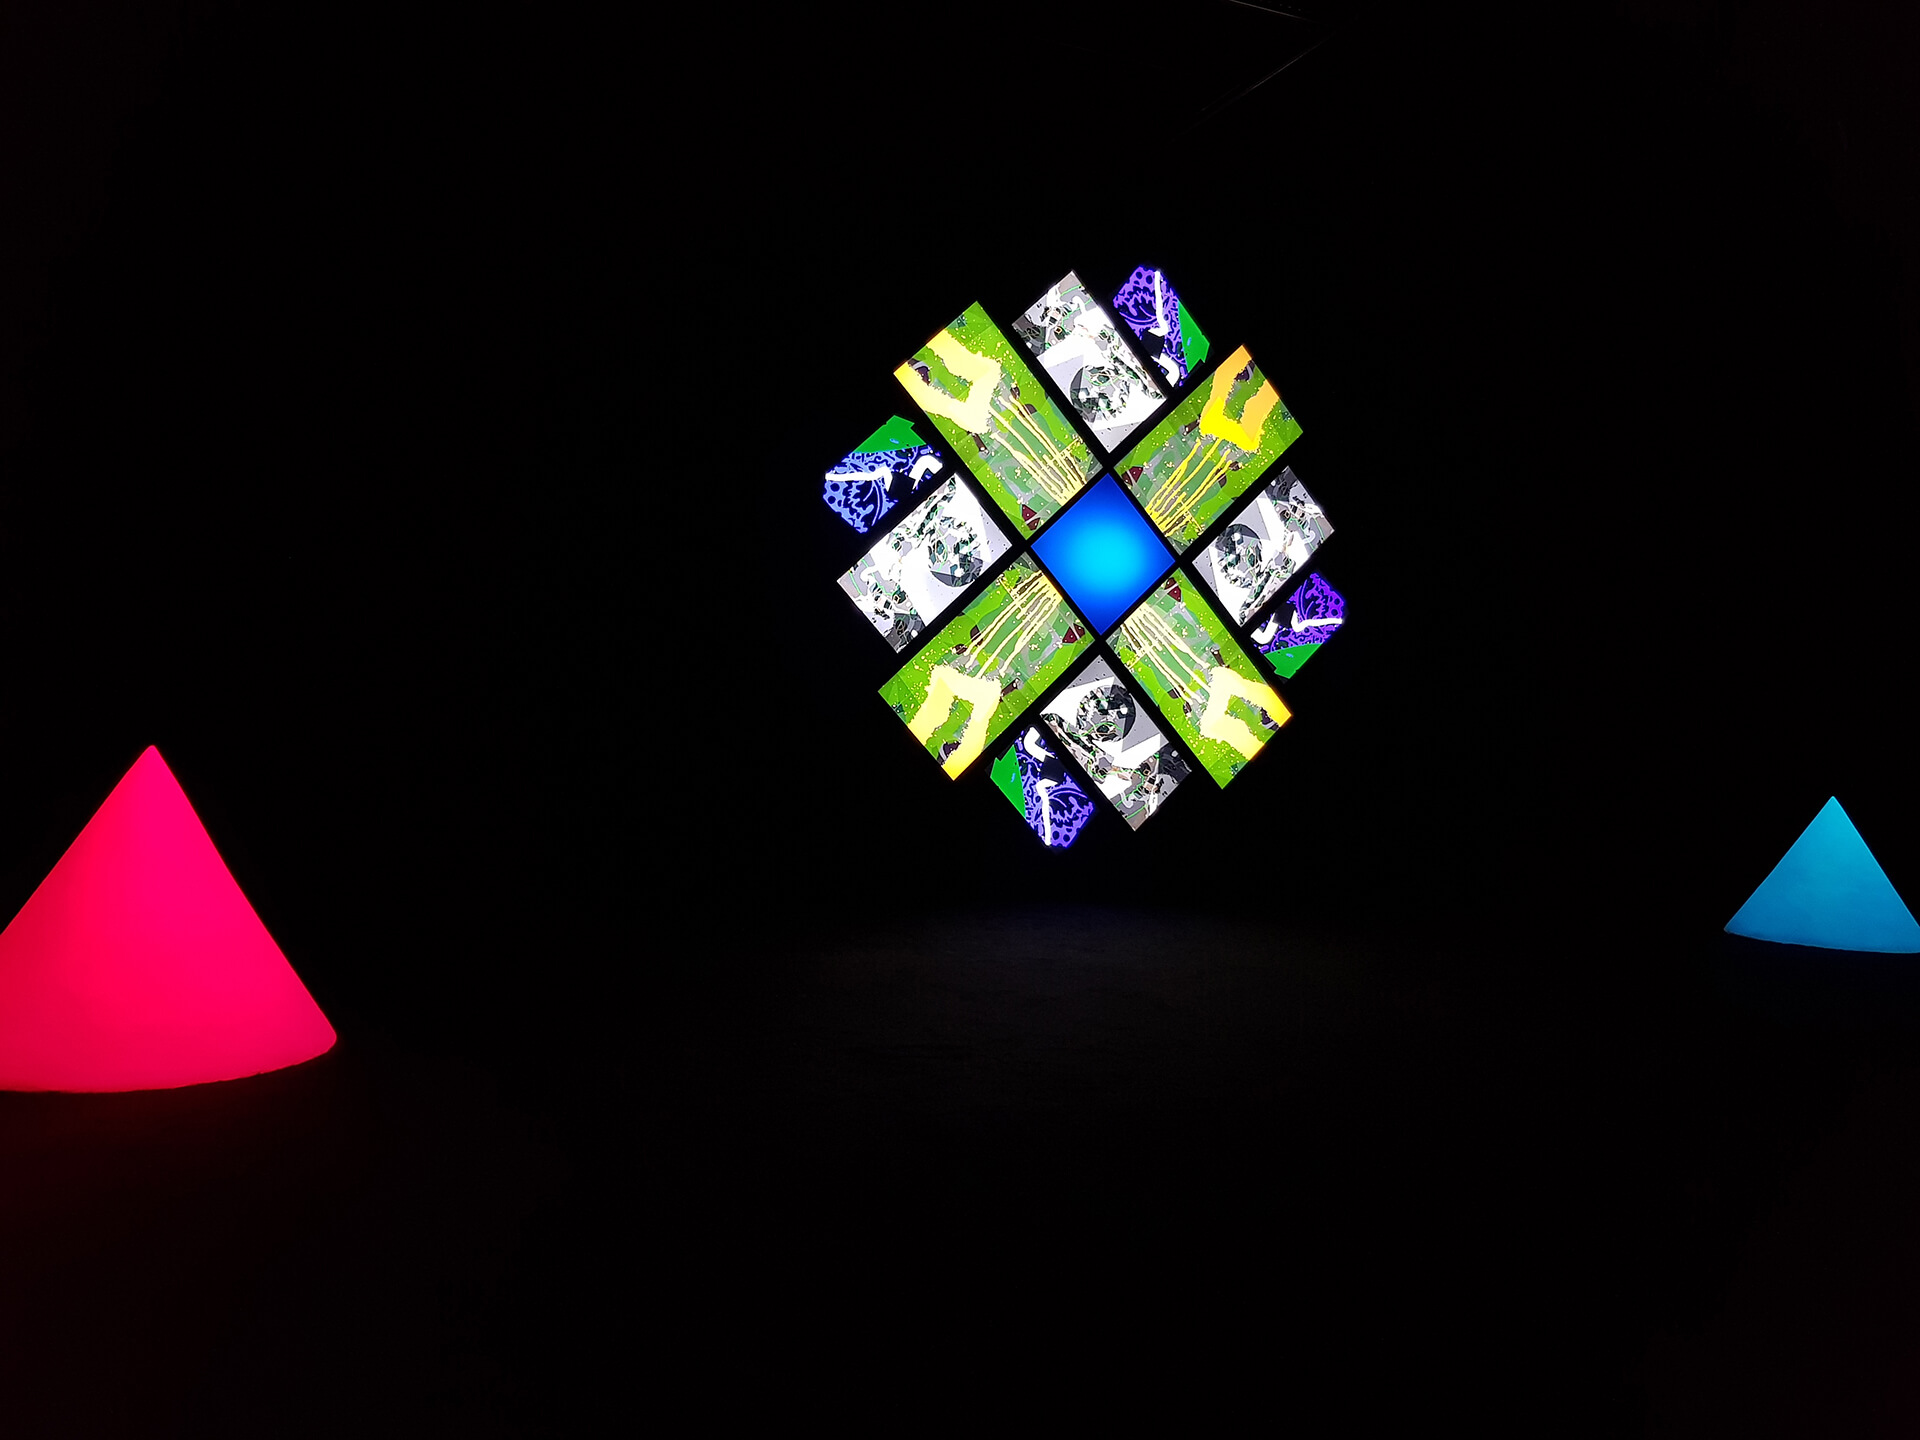 Brian Eno Exhibit at the Stavros Niarchos Center